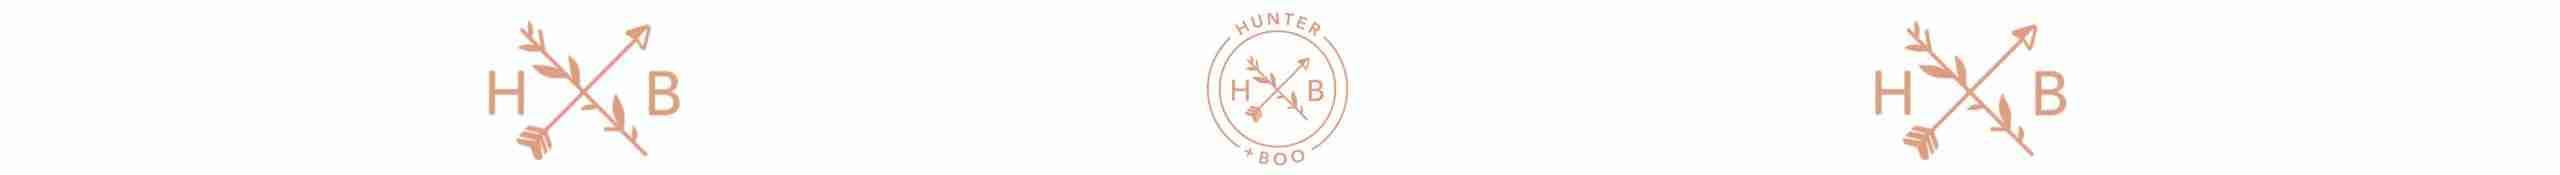 HUNTER AND BOO